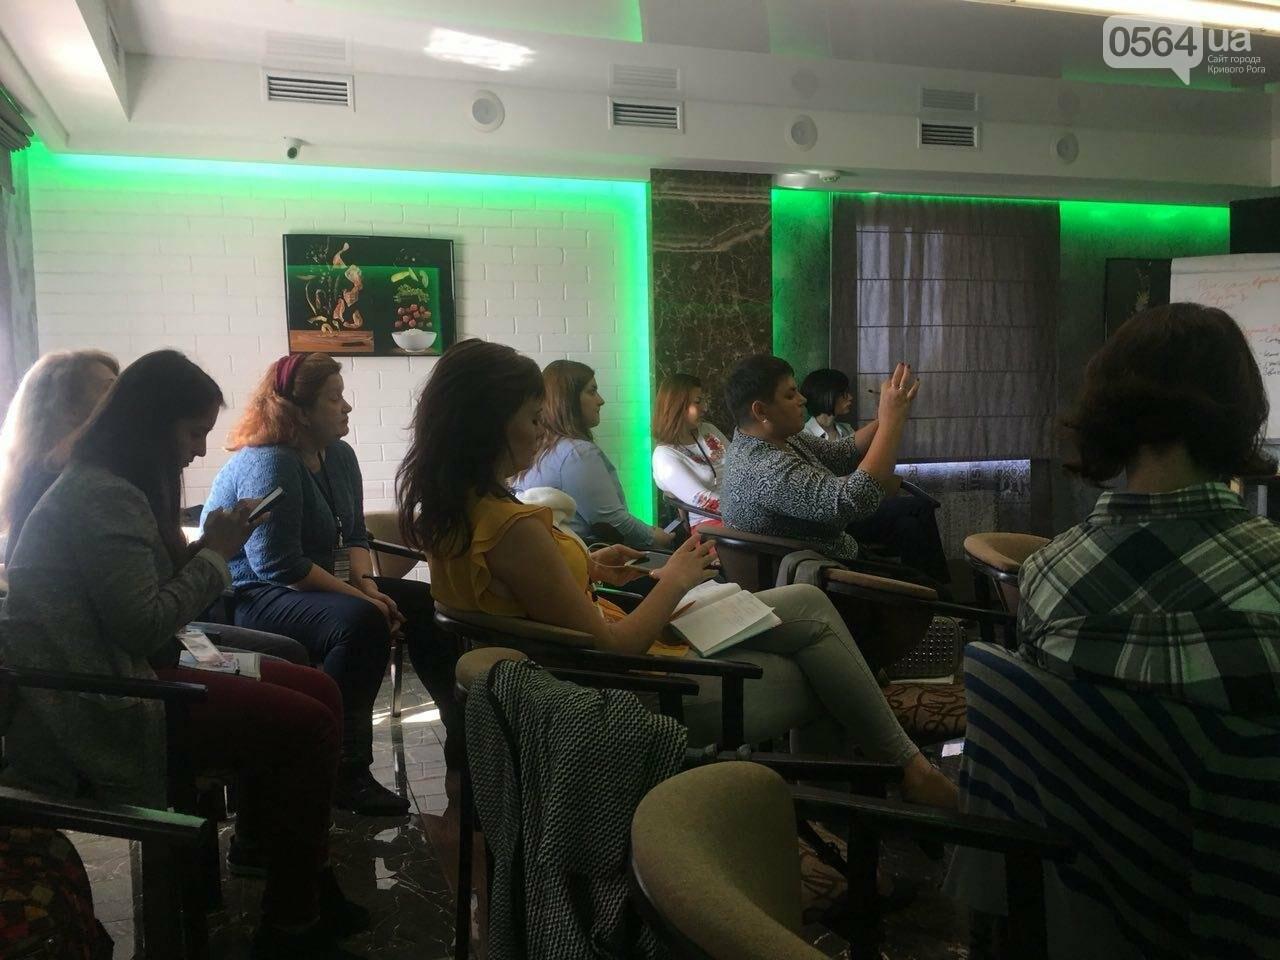 На тренинге о ВИЧ и медреформе криворожским журналистам рассказали о дискриминации и стереотипах, - ФОТО , фото-27